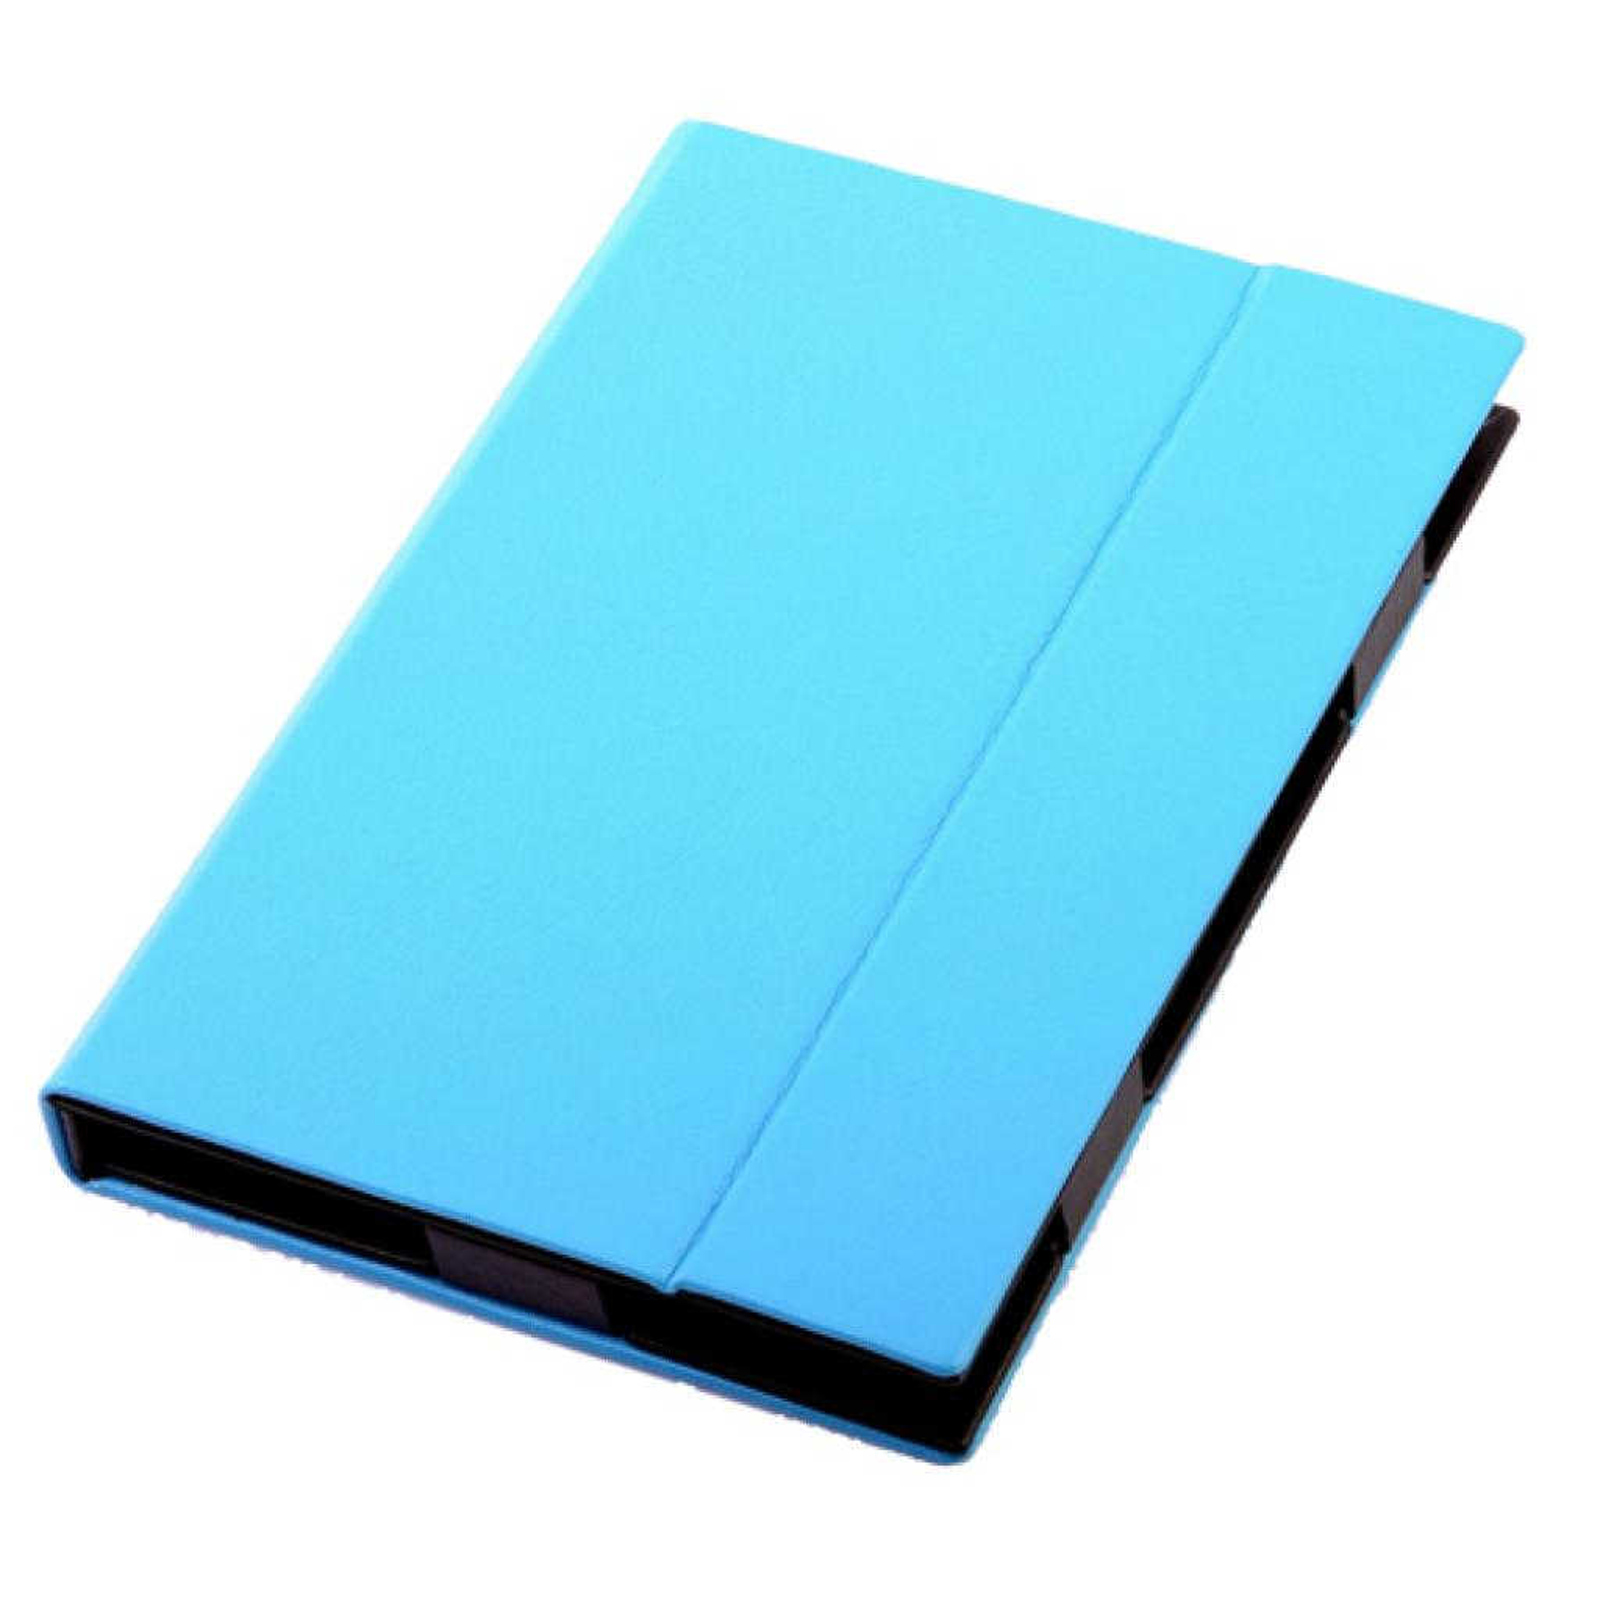 Чехол для планшета Vento 10.1 Desire Bright -blue